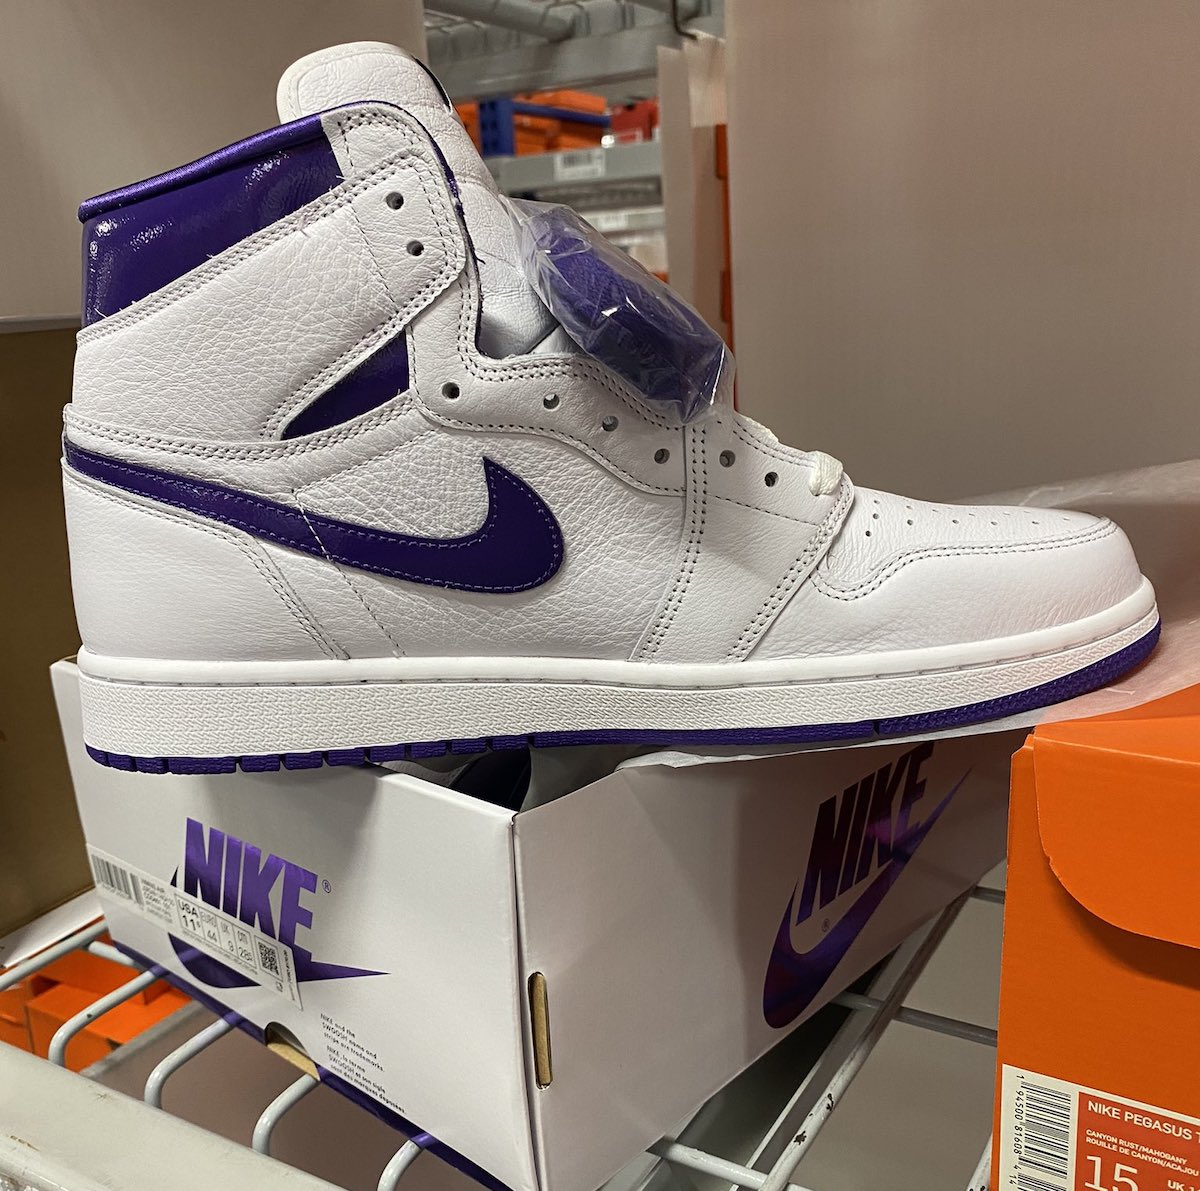 Air Jordan 1 Court Purple Release Date CD0461-151 Medial Side